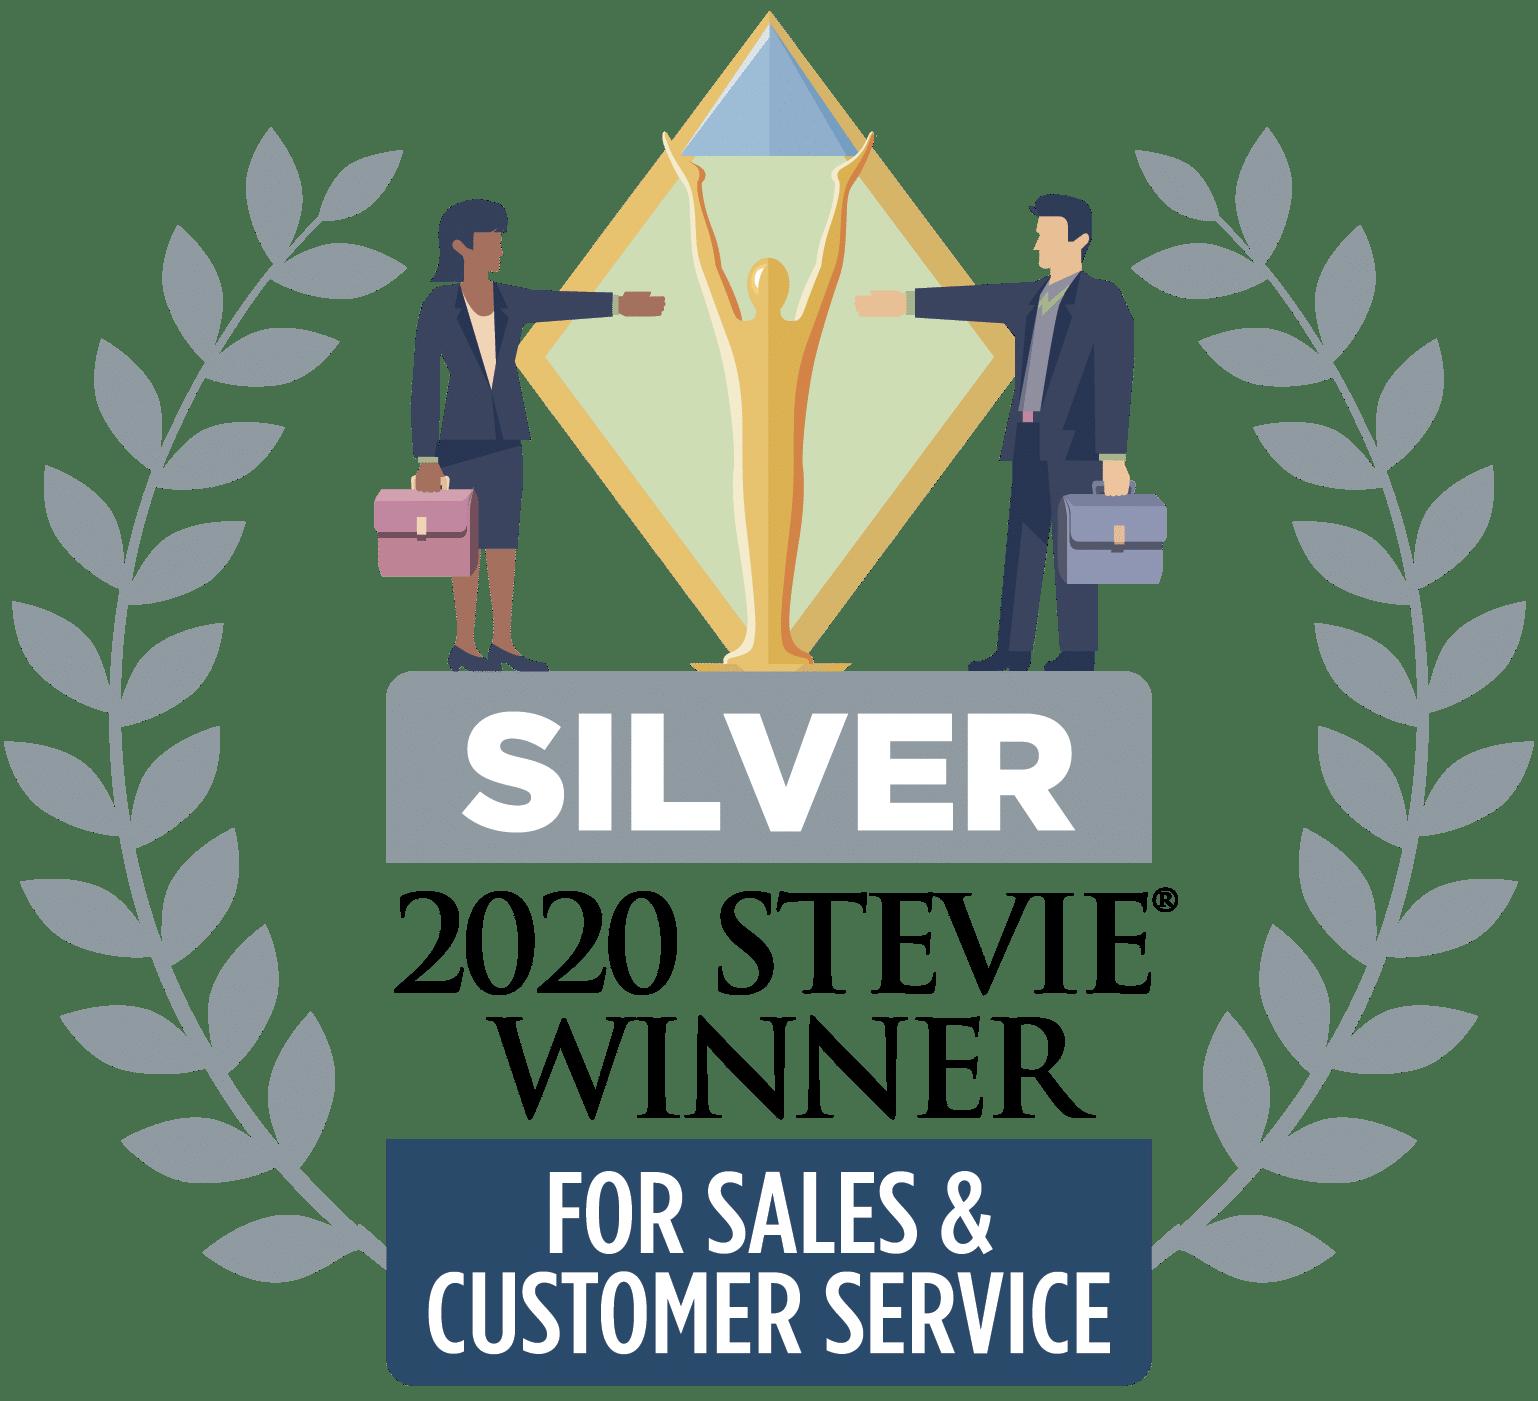 sascs20_silver_winner